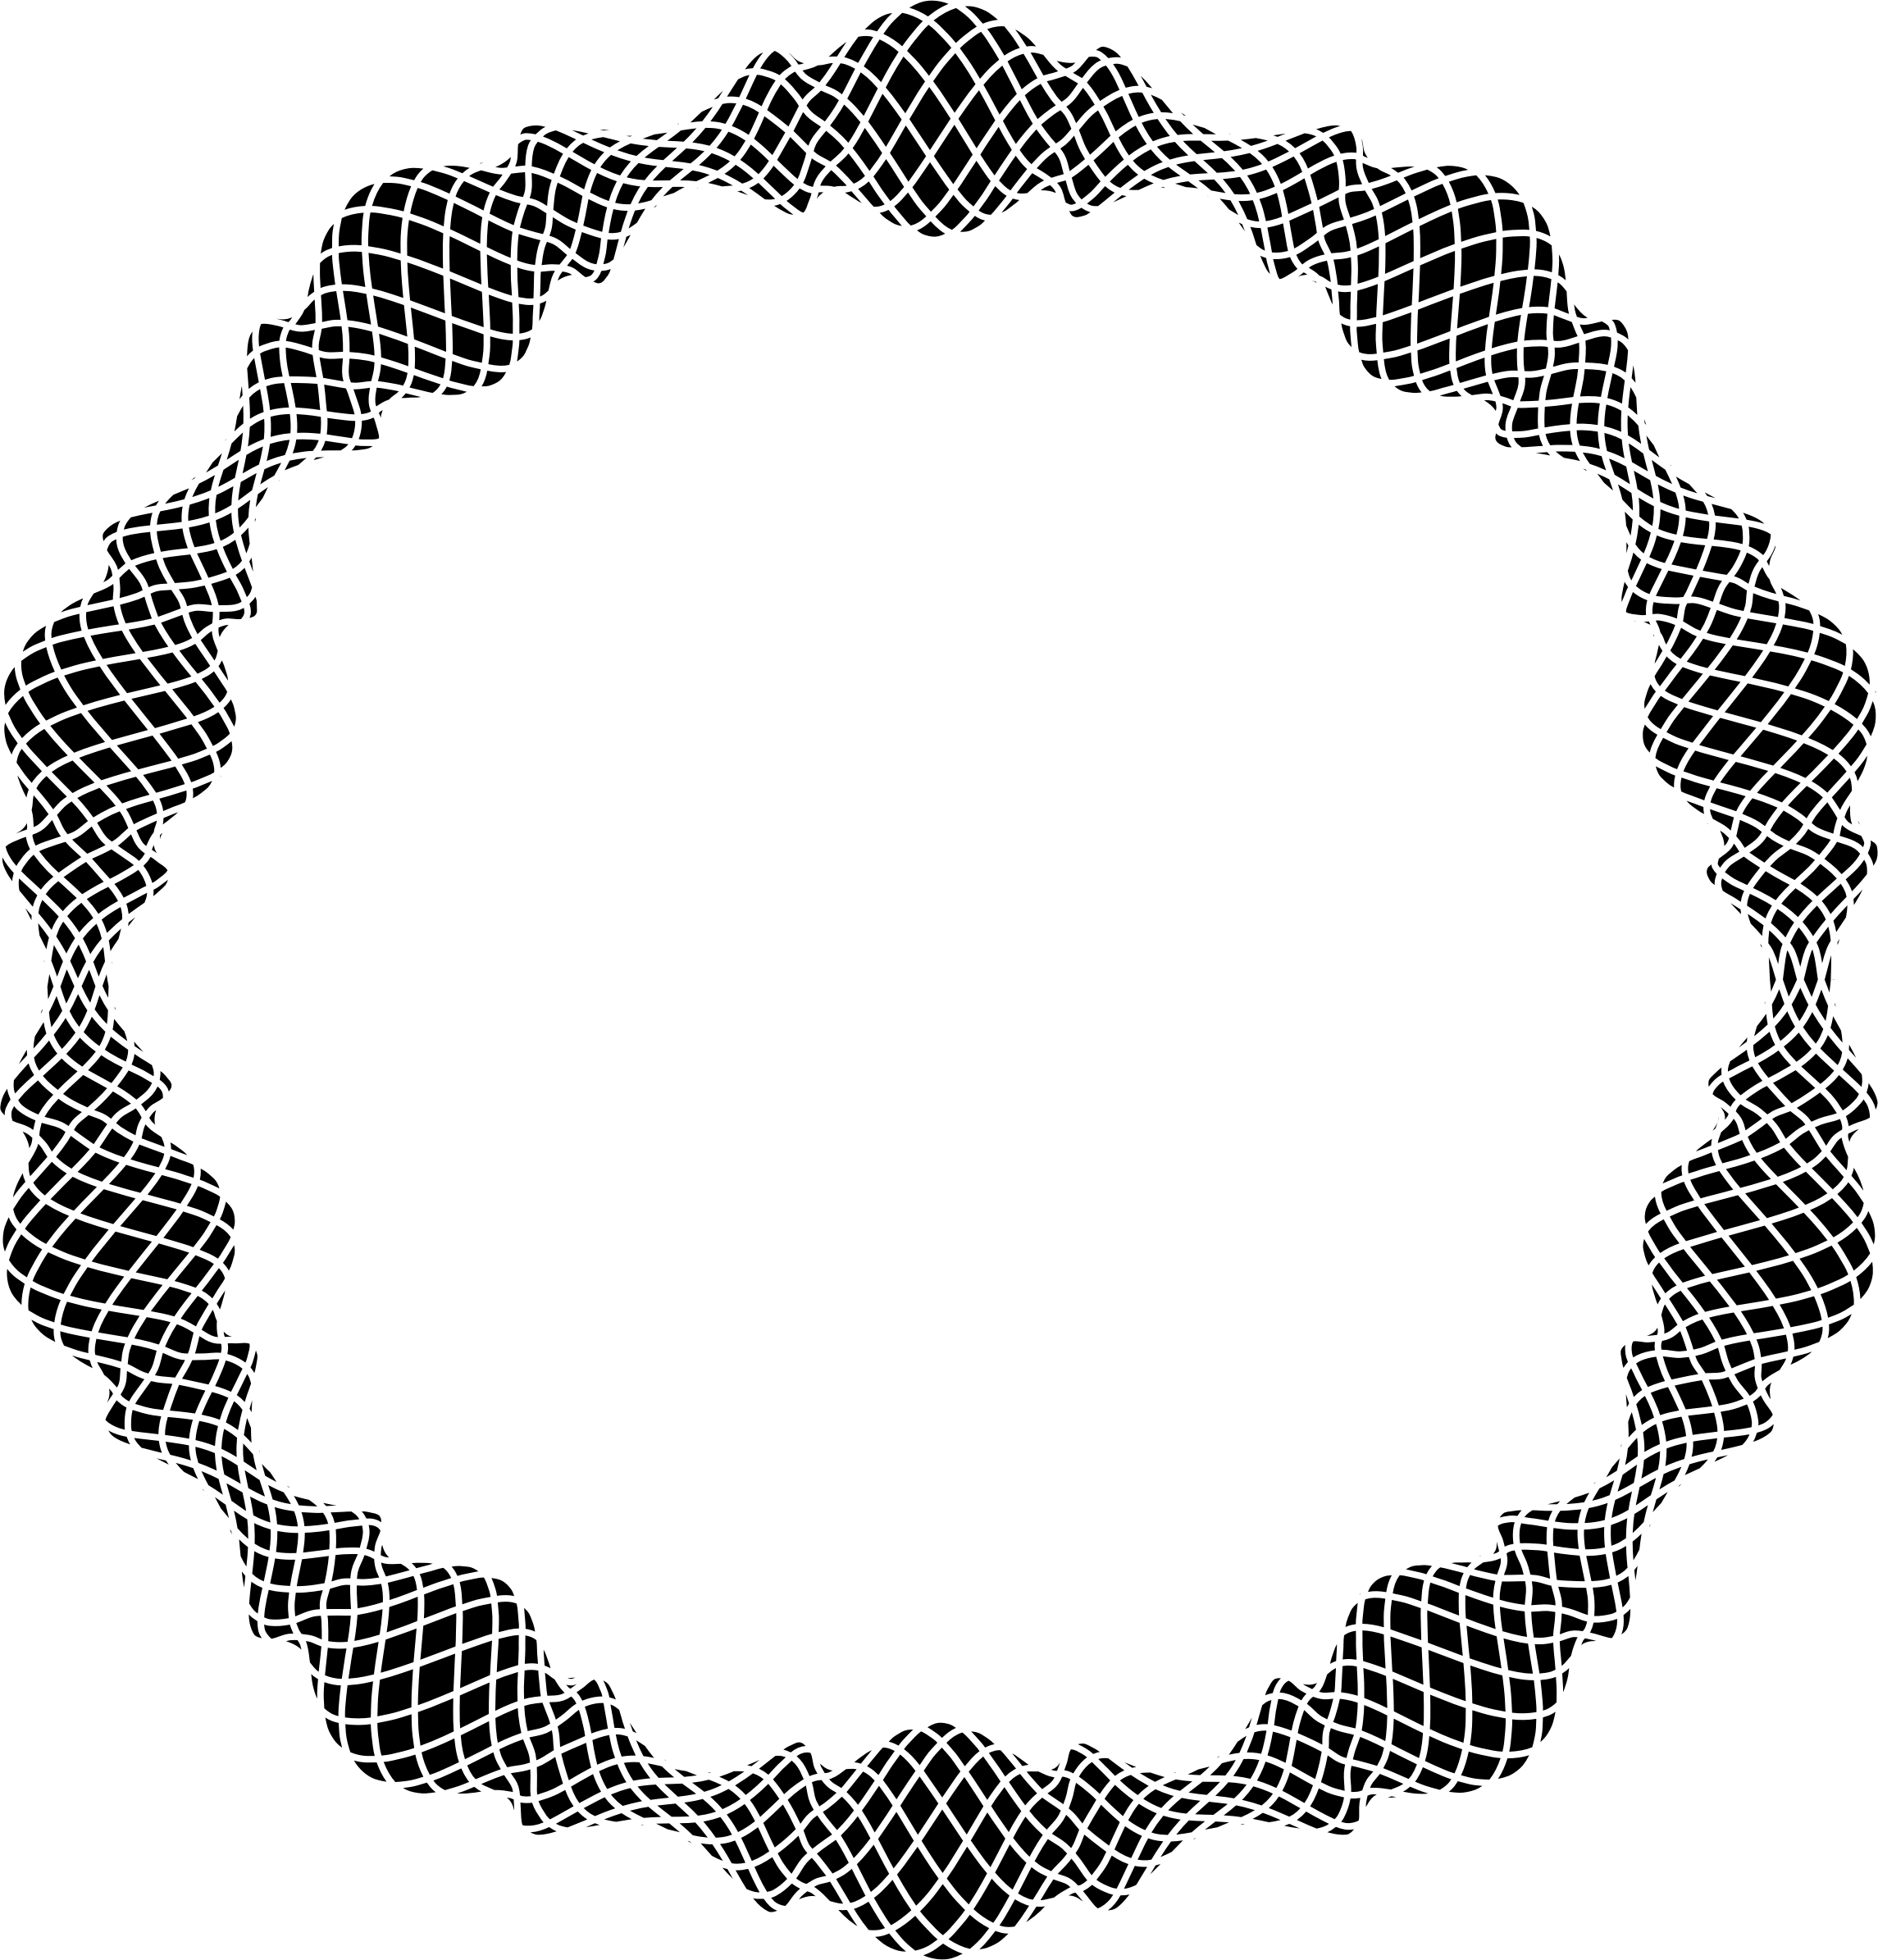 vector freeuse stock Circular frame version big. 6 clipart circle